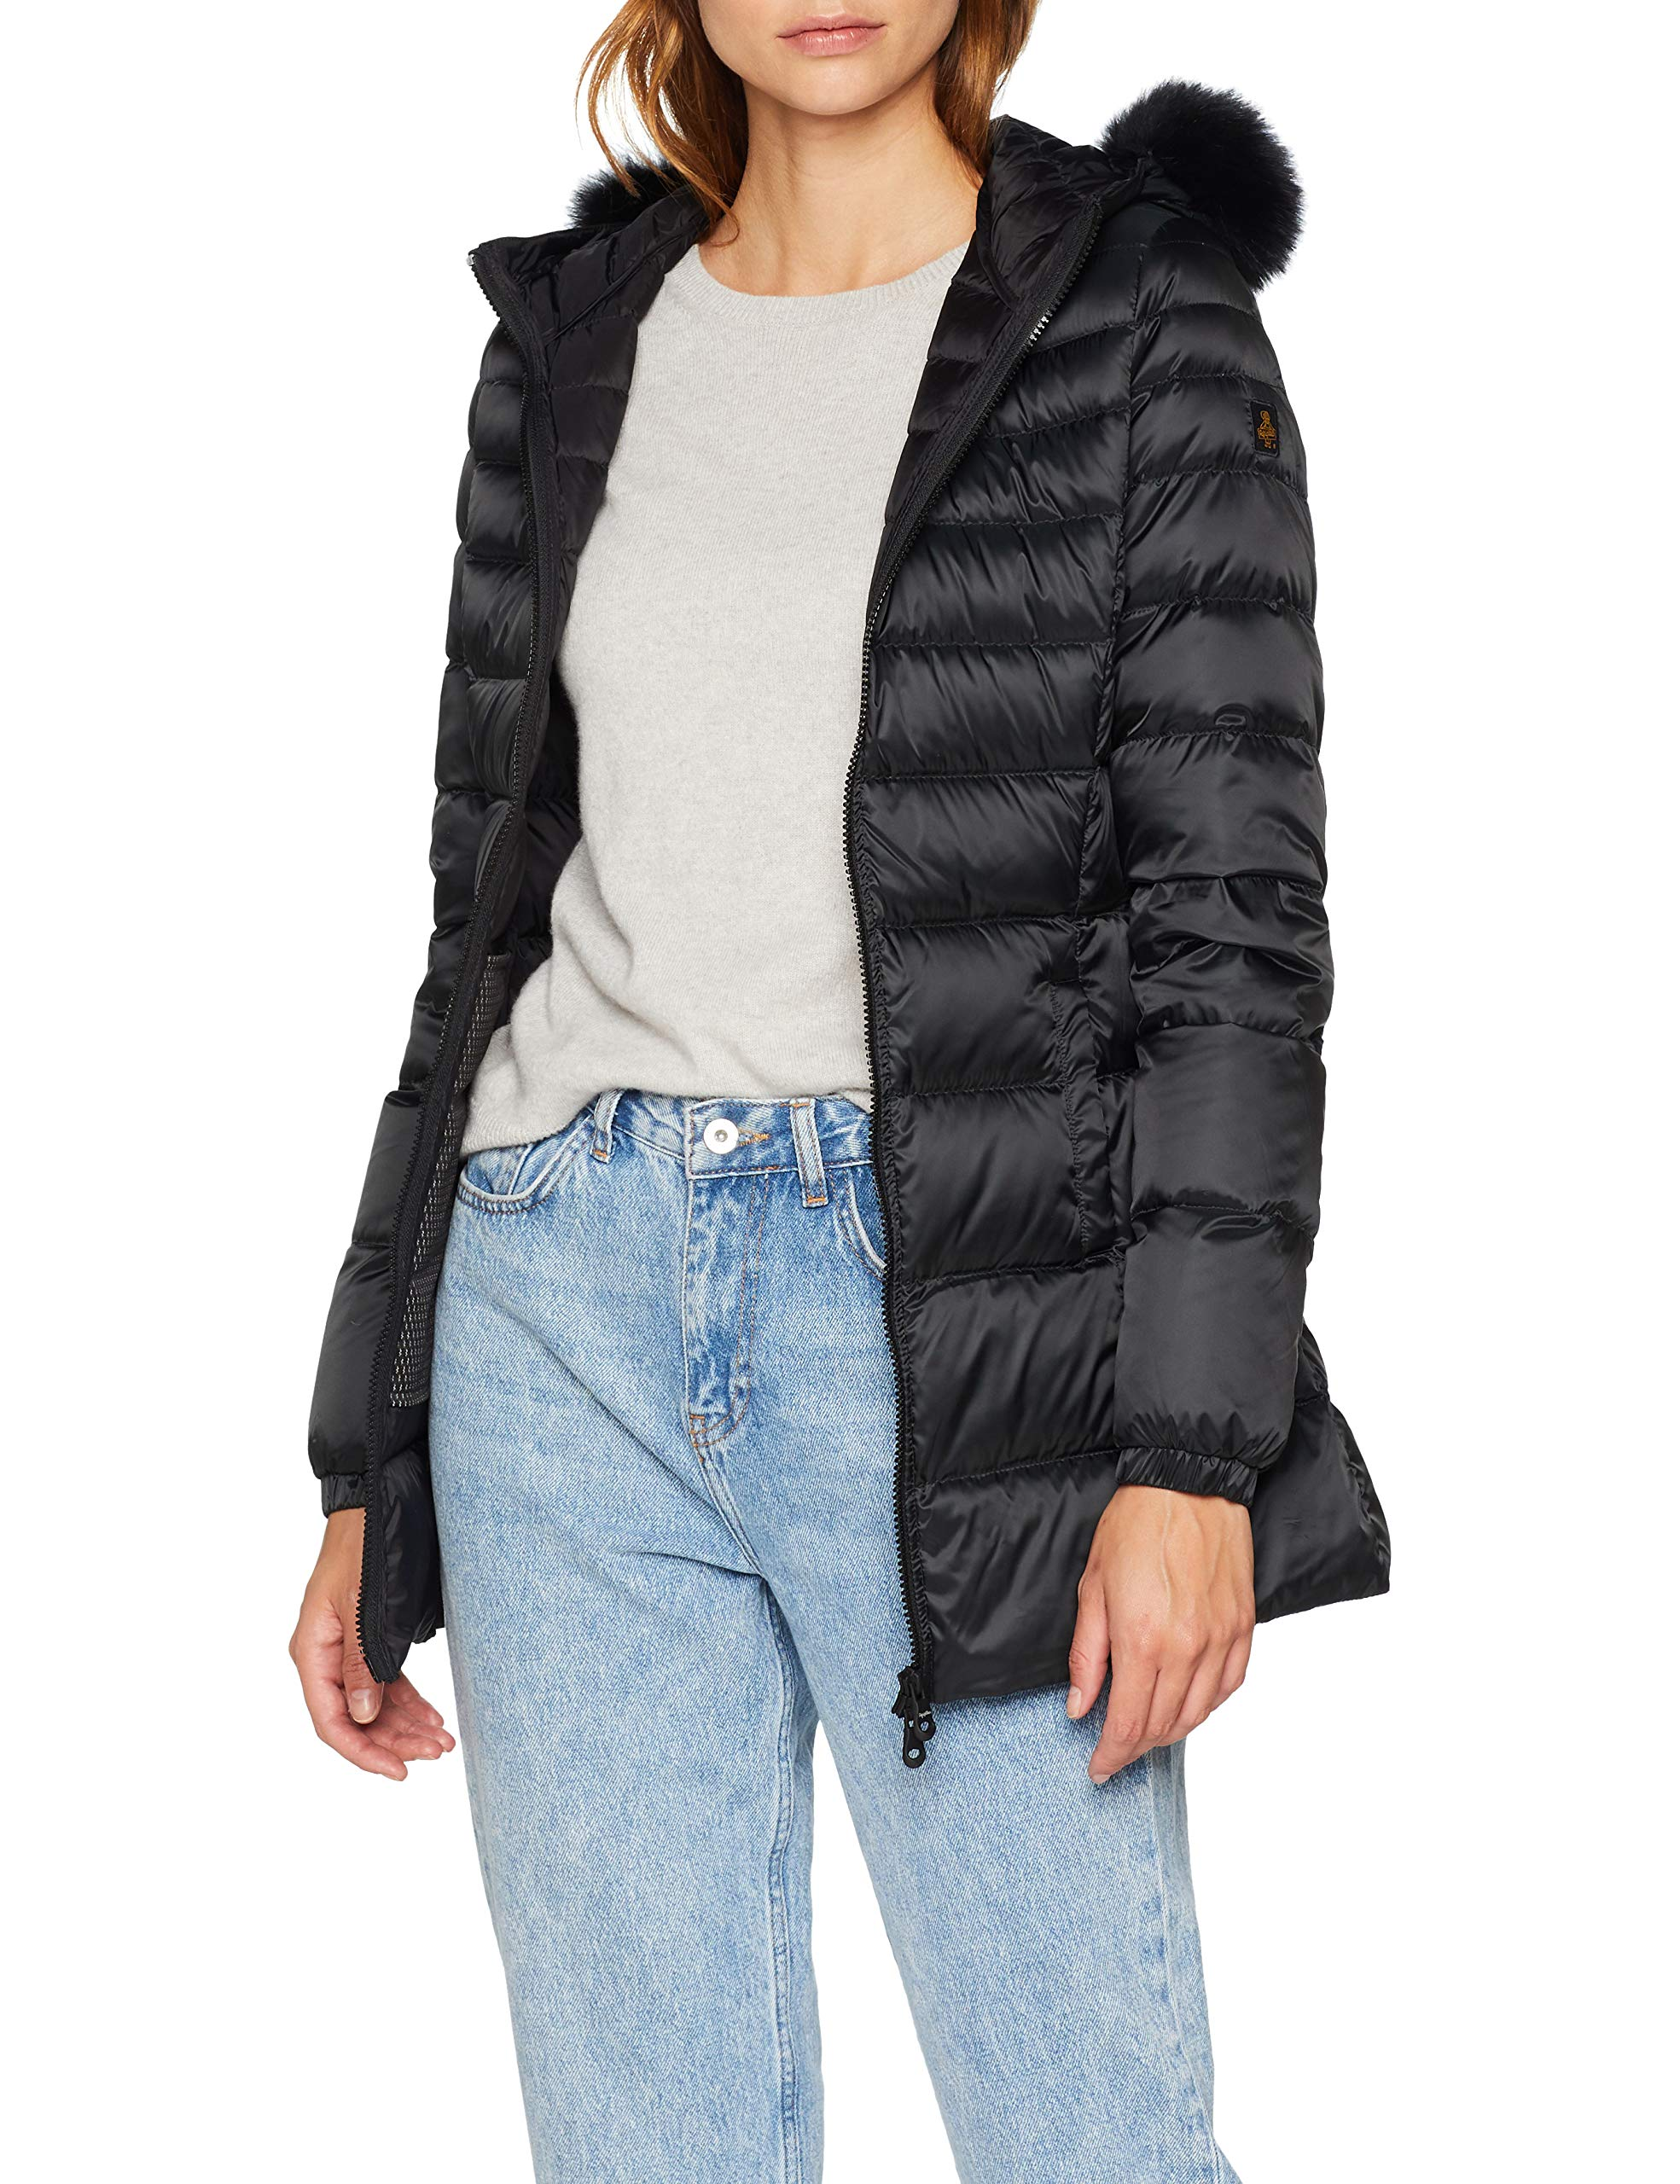 G06000M Long FurManteau FemmeNoirnero Mead Refrigiwear 0Ok8nwP